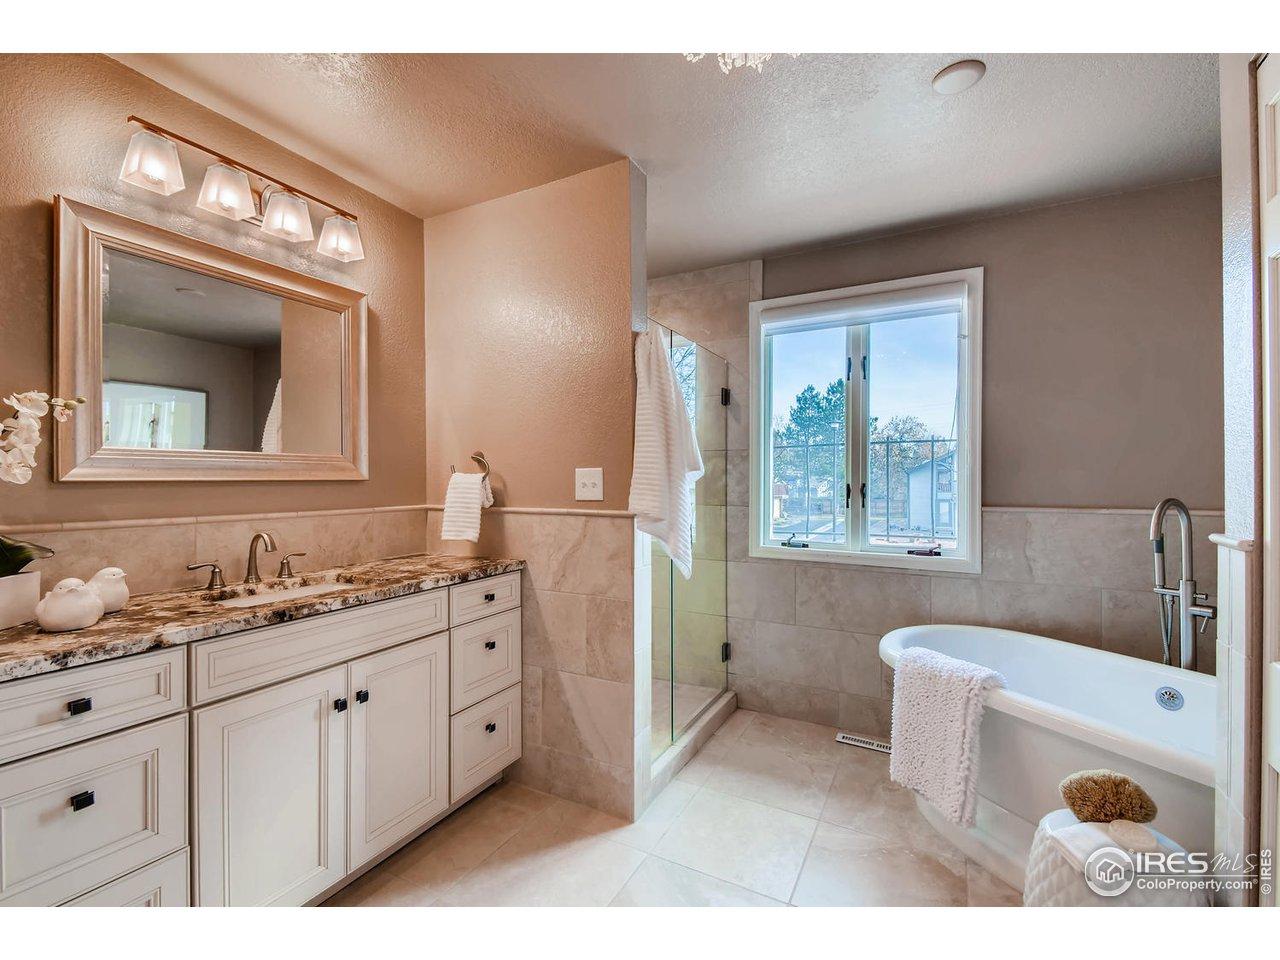 Luxurious & All New Upper  Bath w/ Soaking Tub